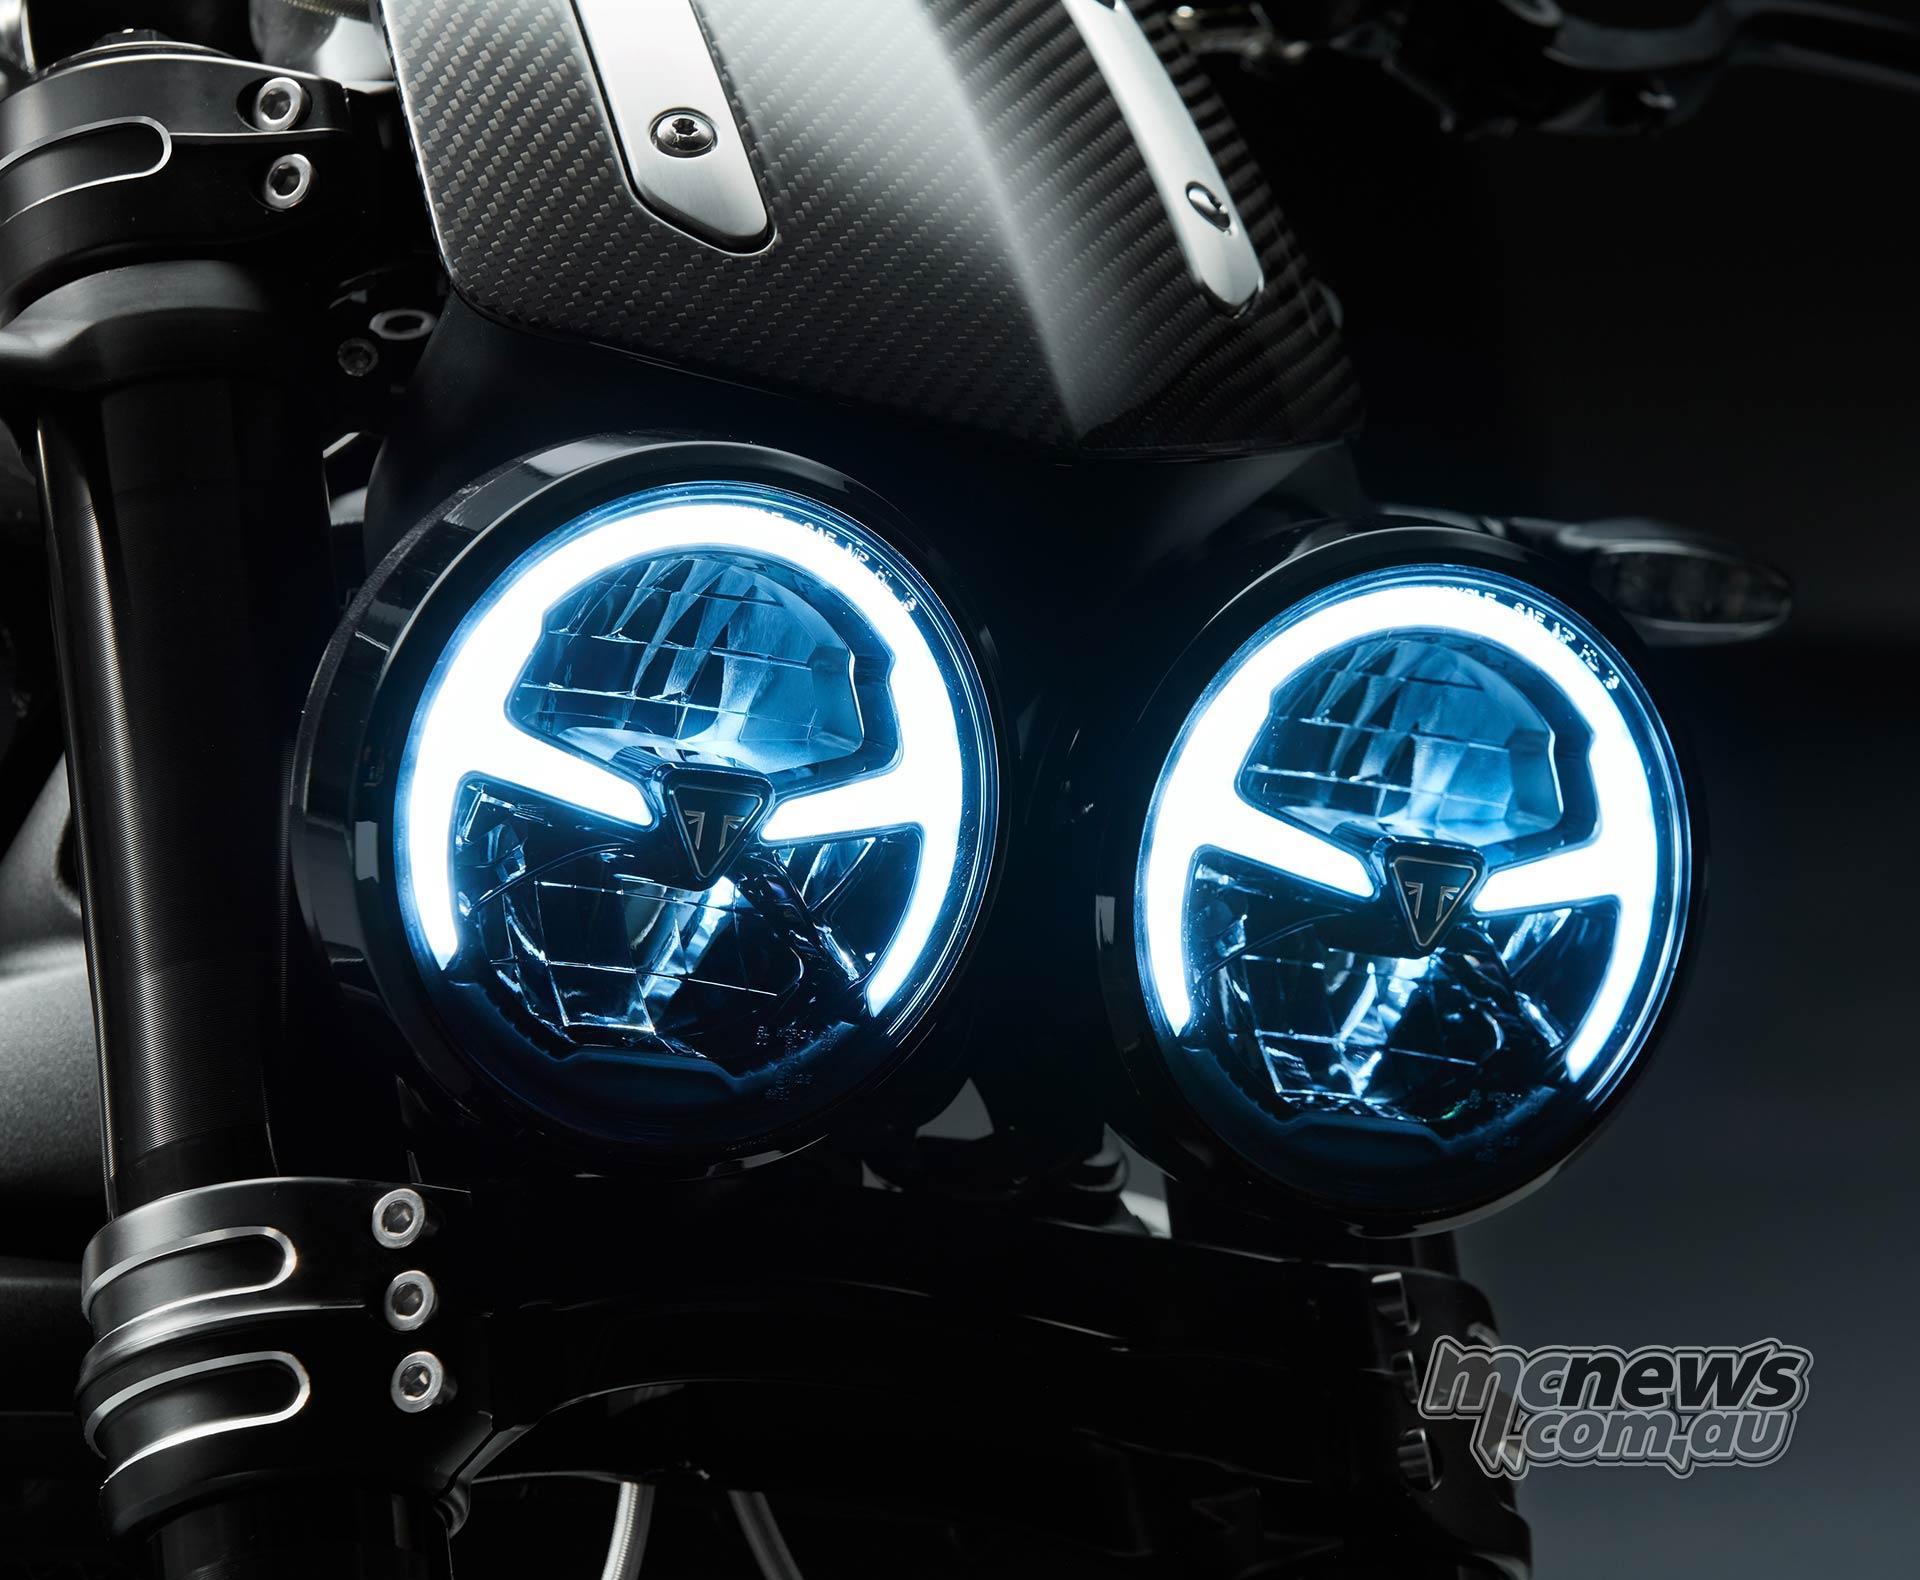 Triumph Rocket TFC Lights